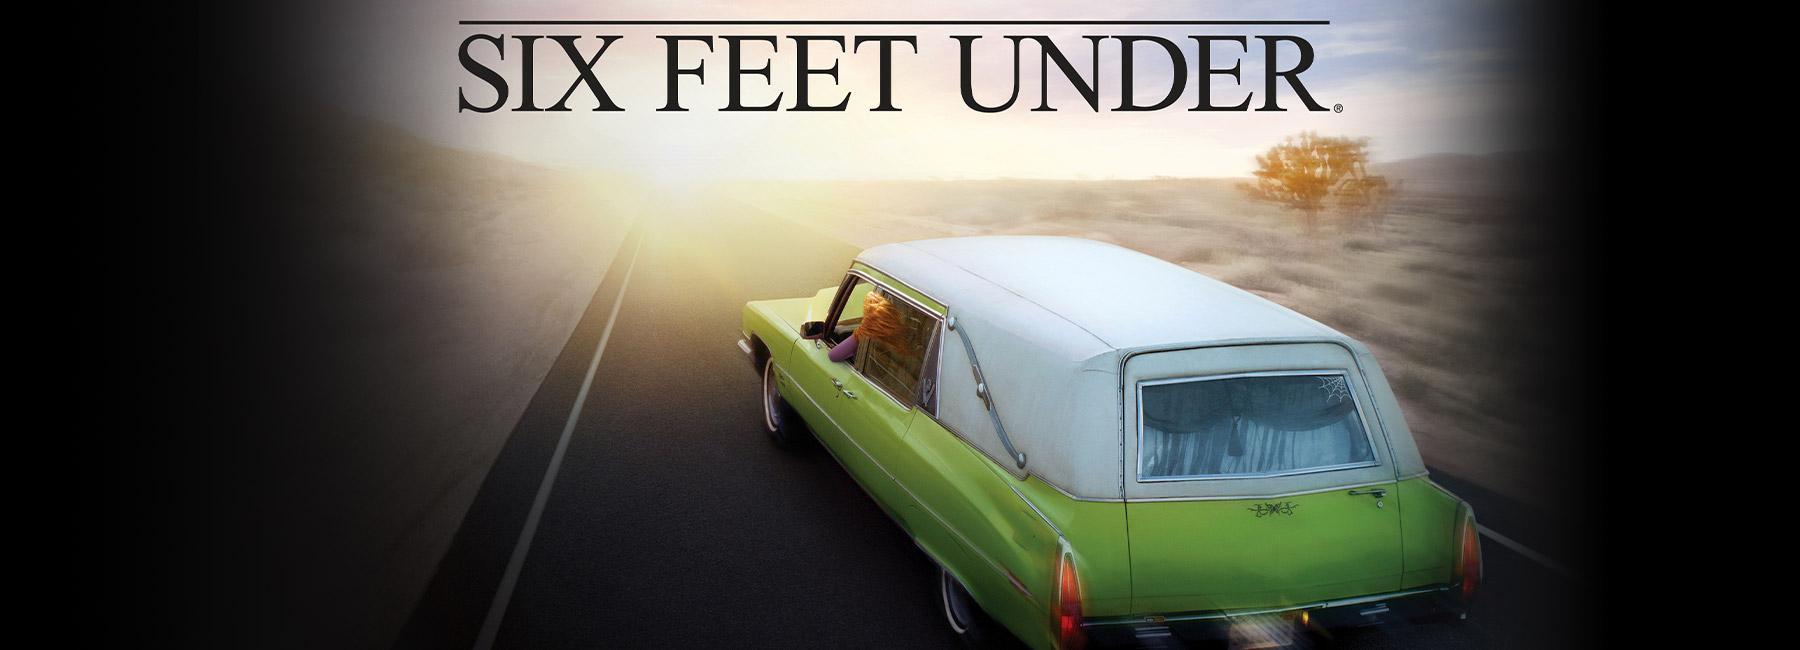 Sky X Six Feet Under